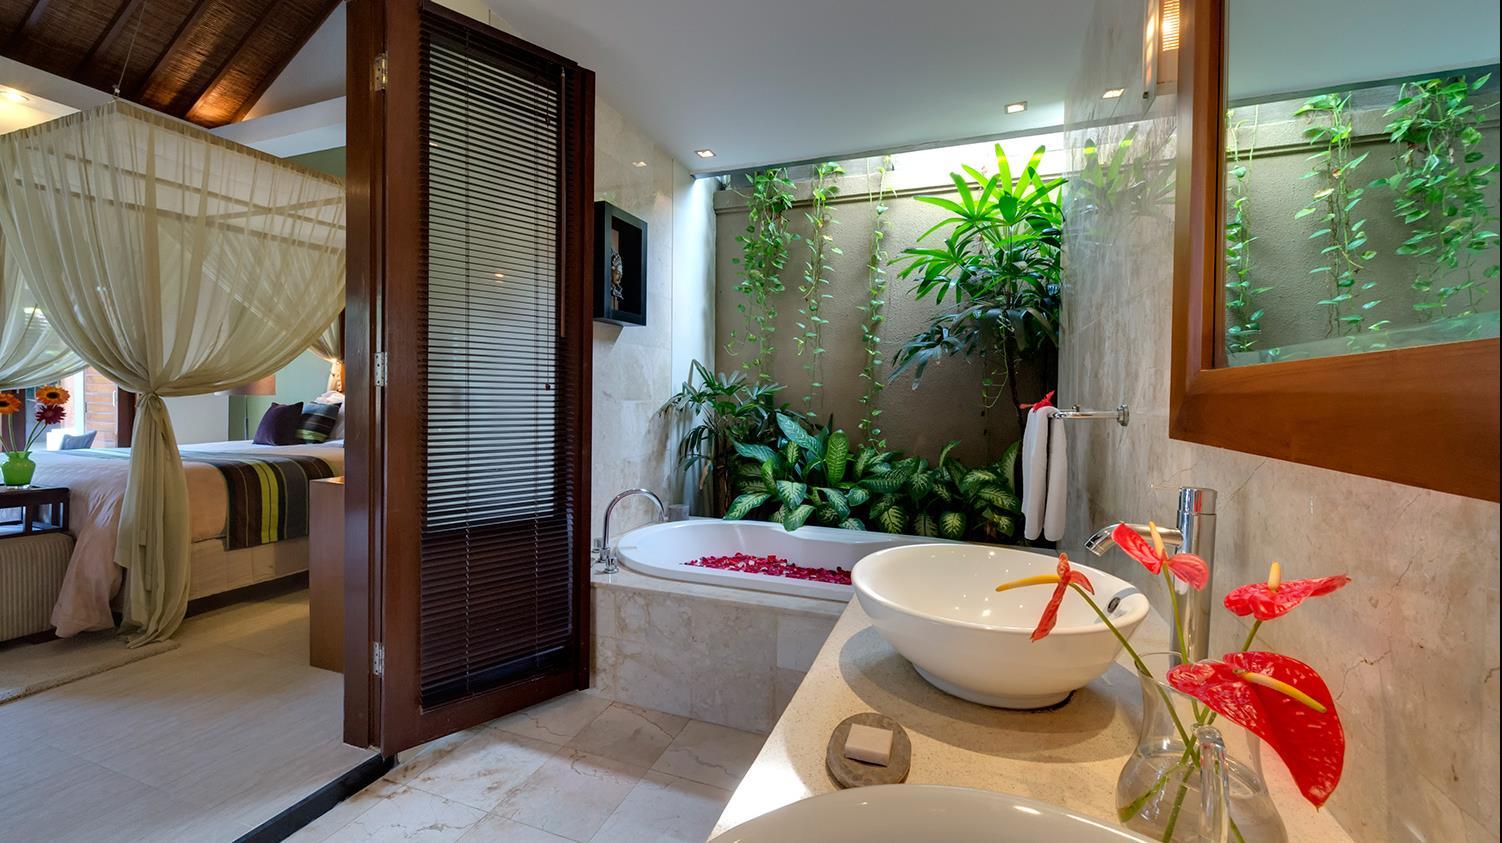 Bathtub with Rose Petals - Lakshmi Villas - Seminyak, Bali